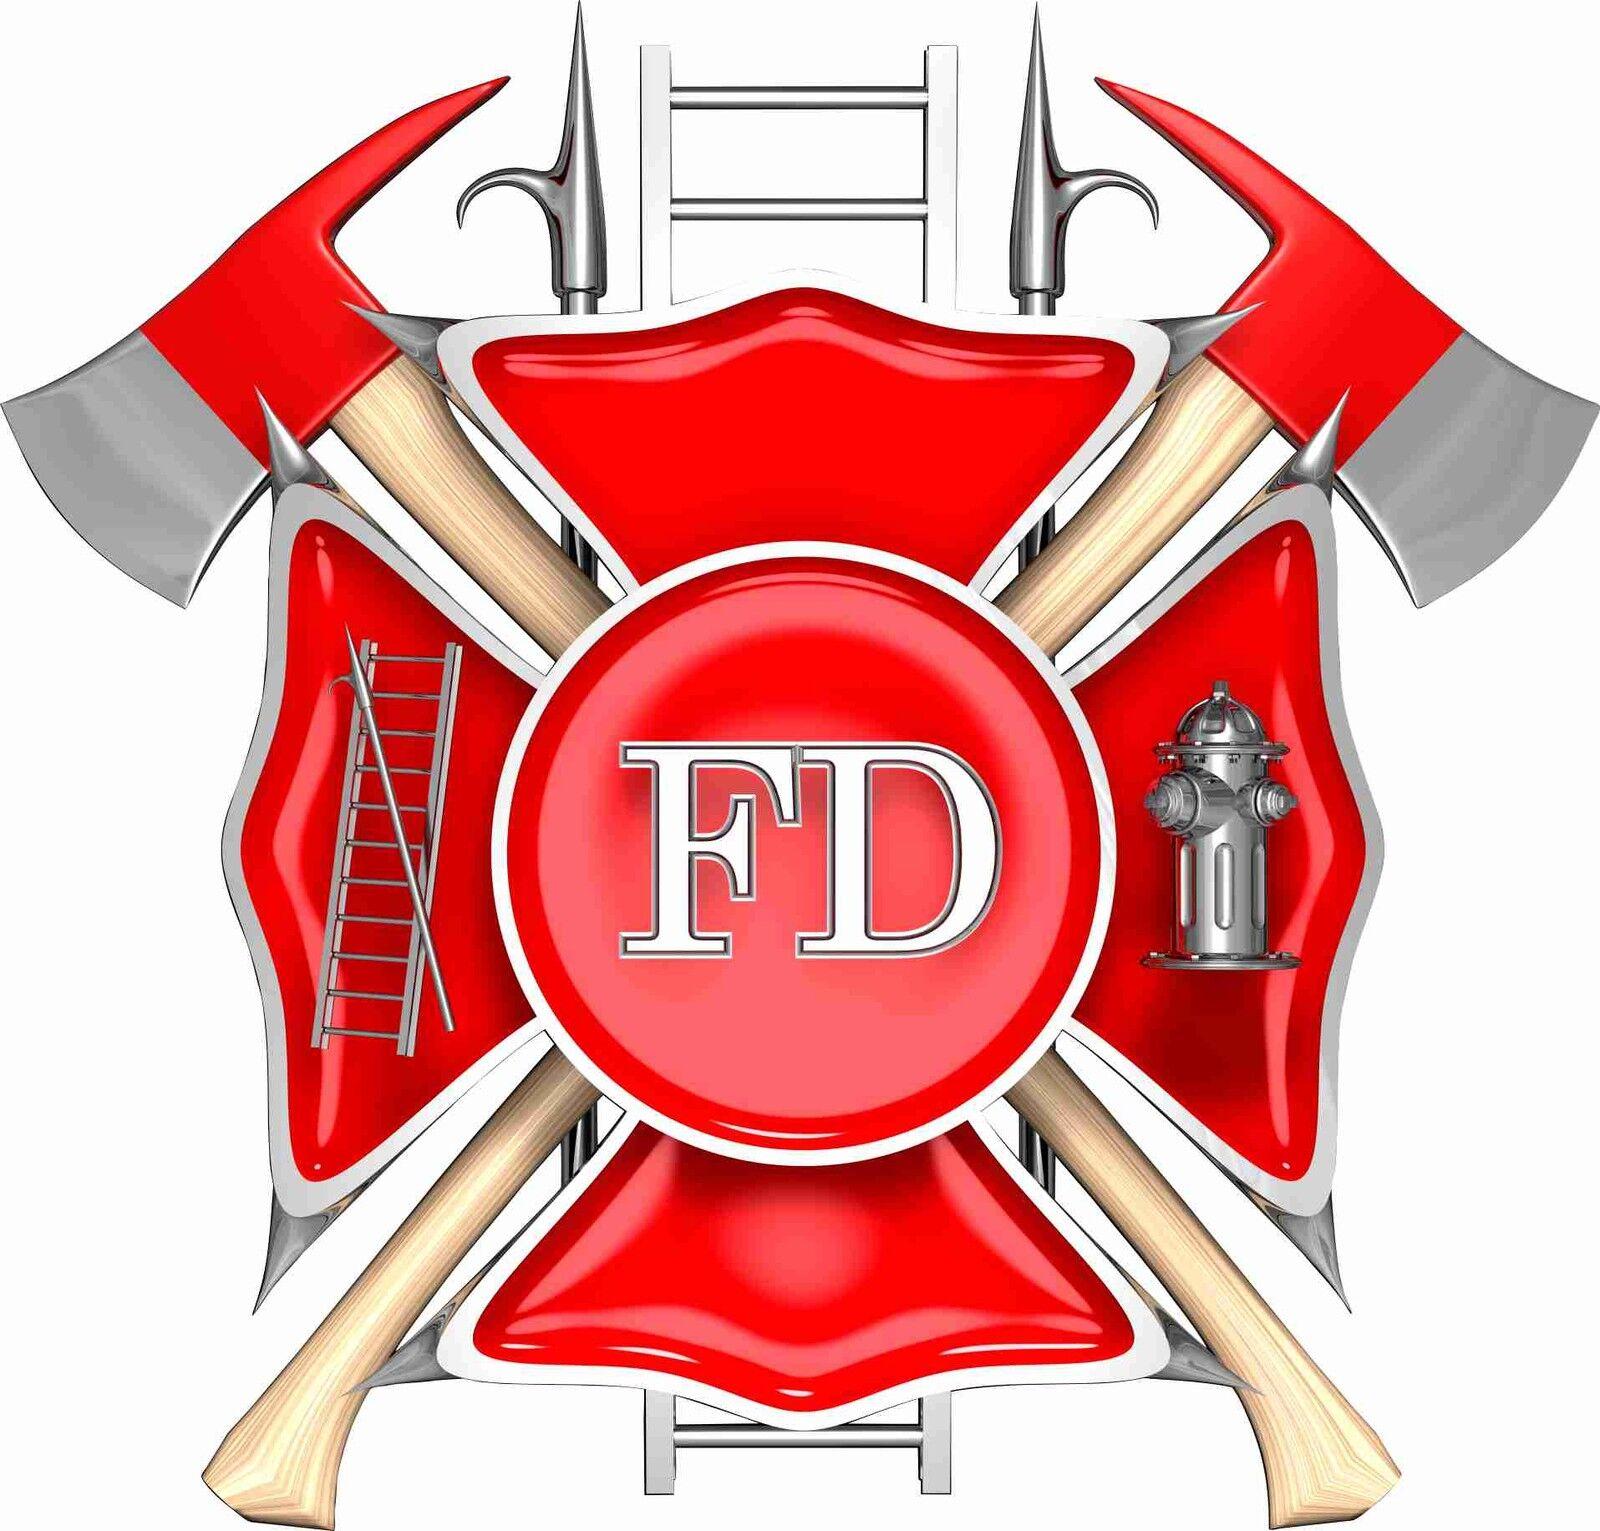 Fireman Fire fighter logo  Cornhole Board Game Decal Set Super Nice Image